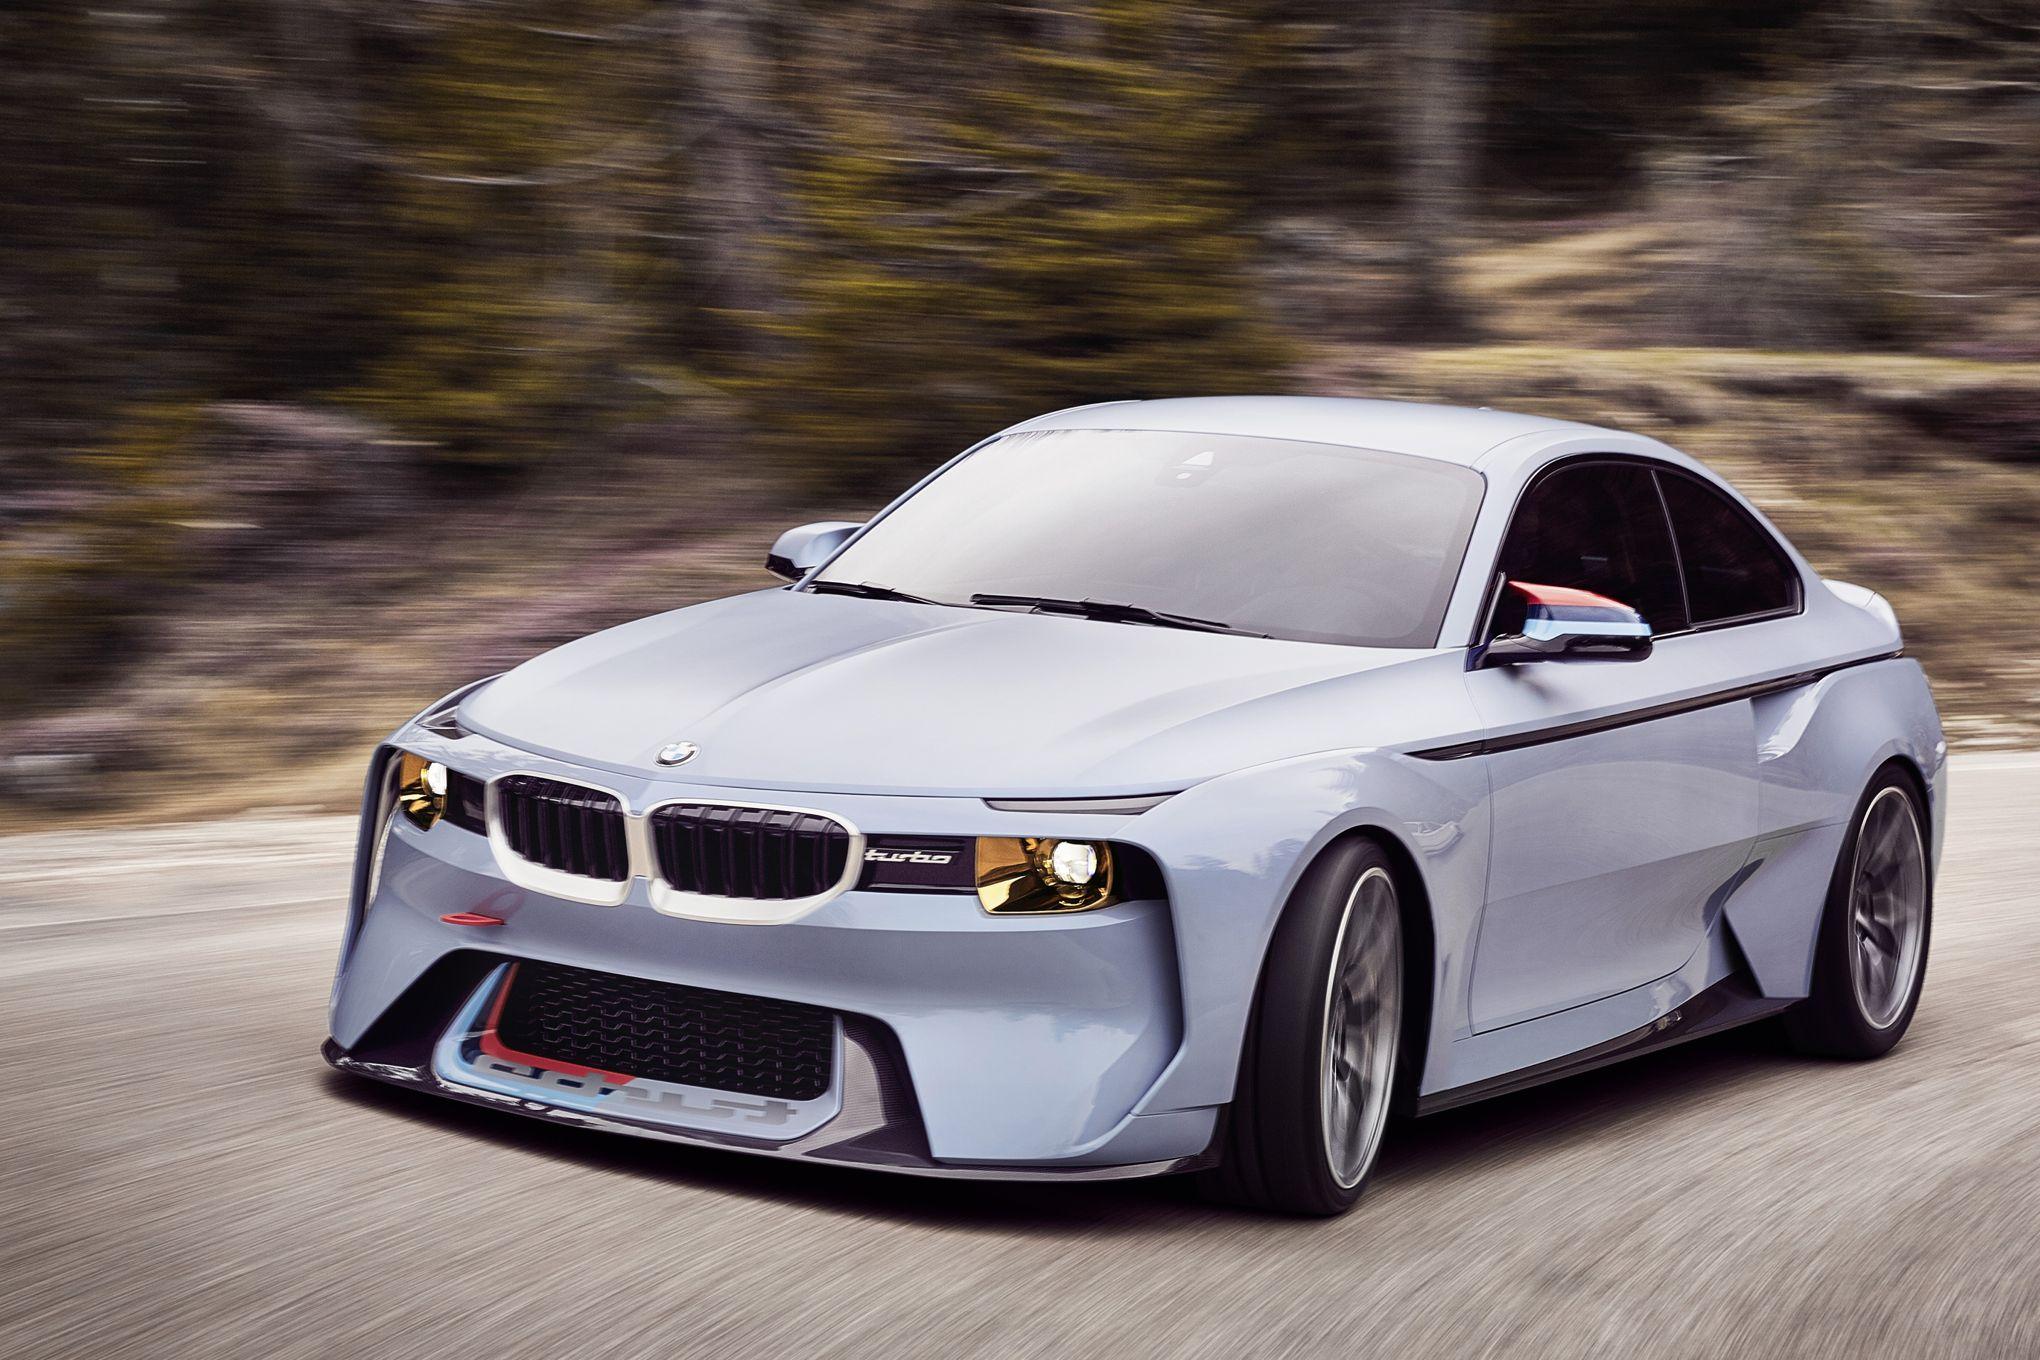 2019 - [BMW] M3/M4 - Page 5 XVM11006b4e-20eb-11e6-9053-e86a353c239c-300x200